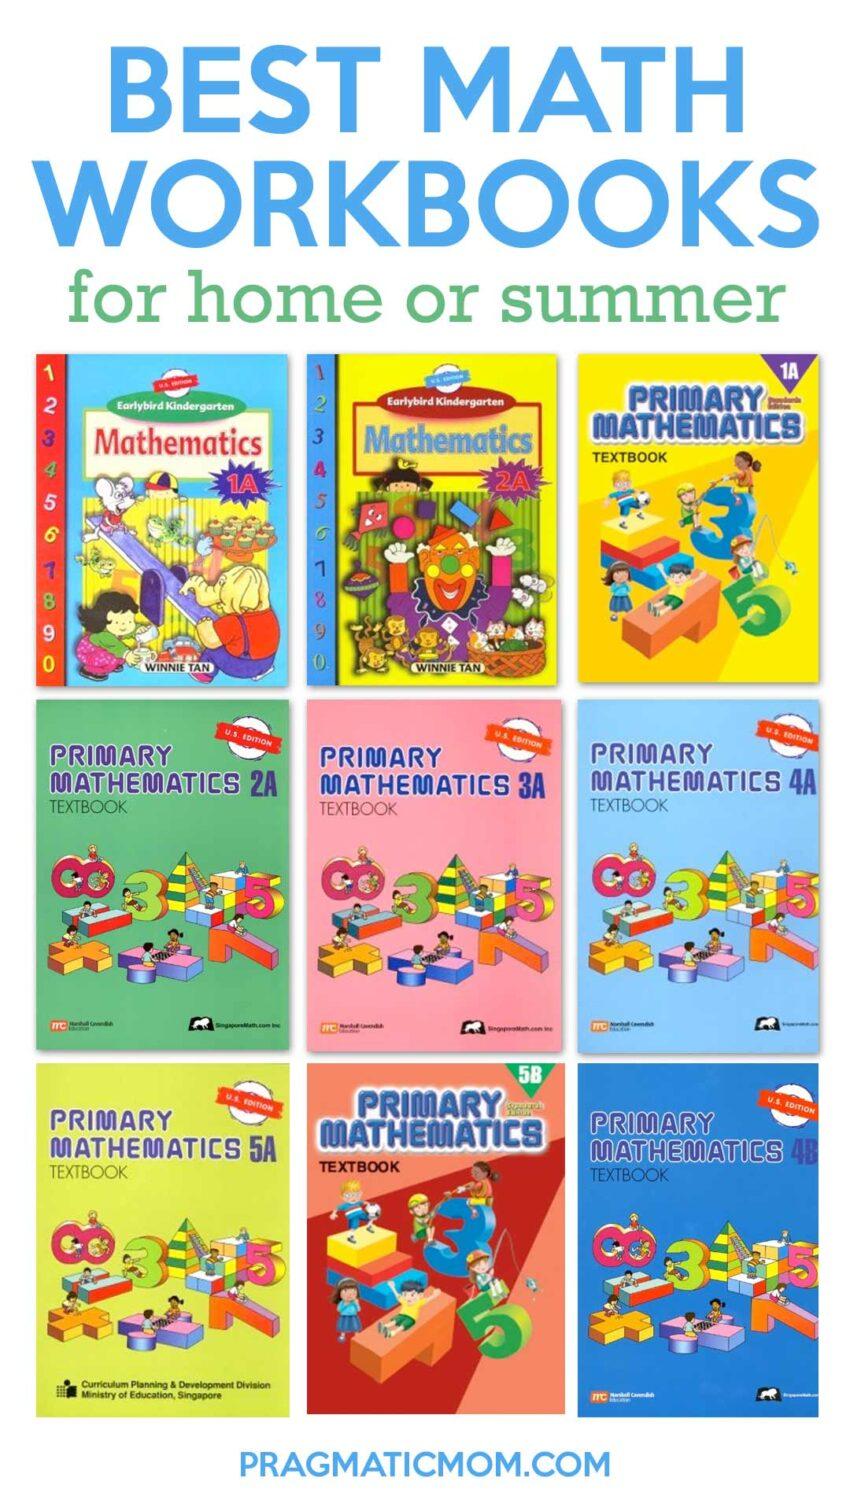 Best Math Workbooks for Home or Summer Supplementation